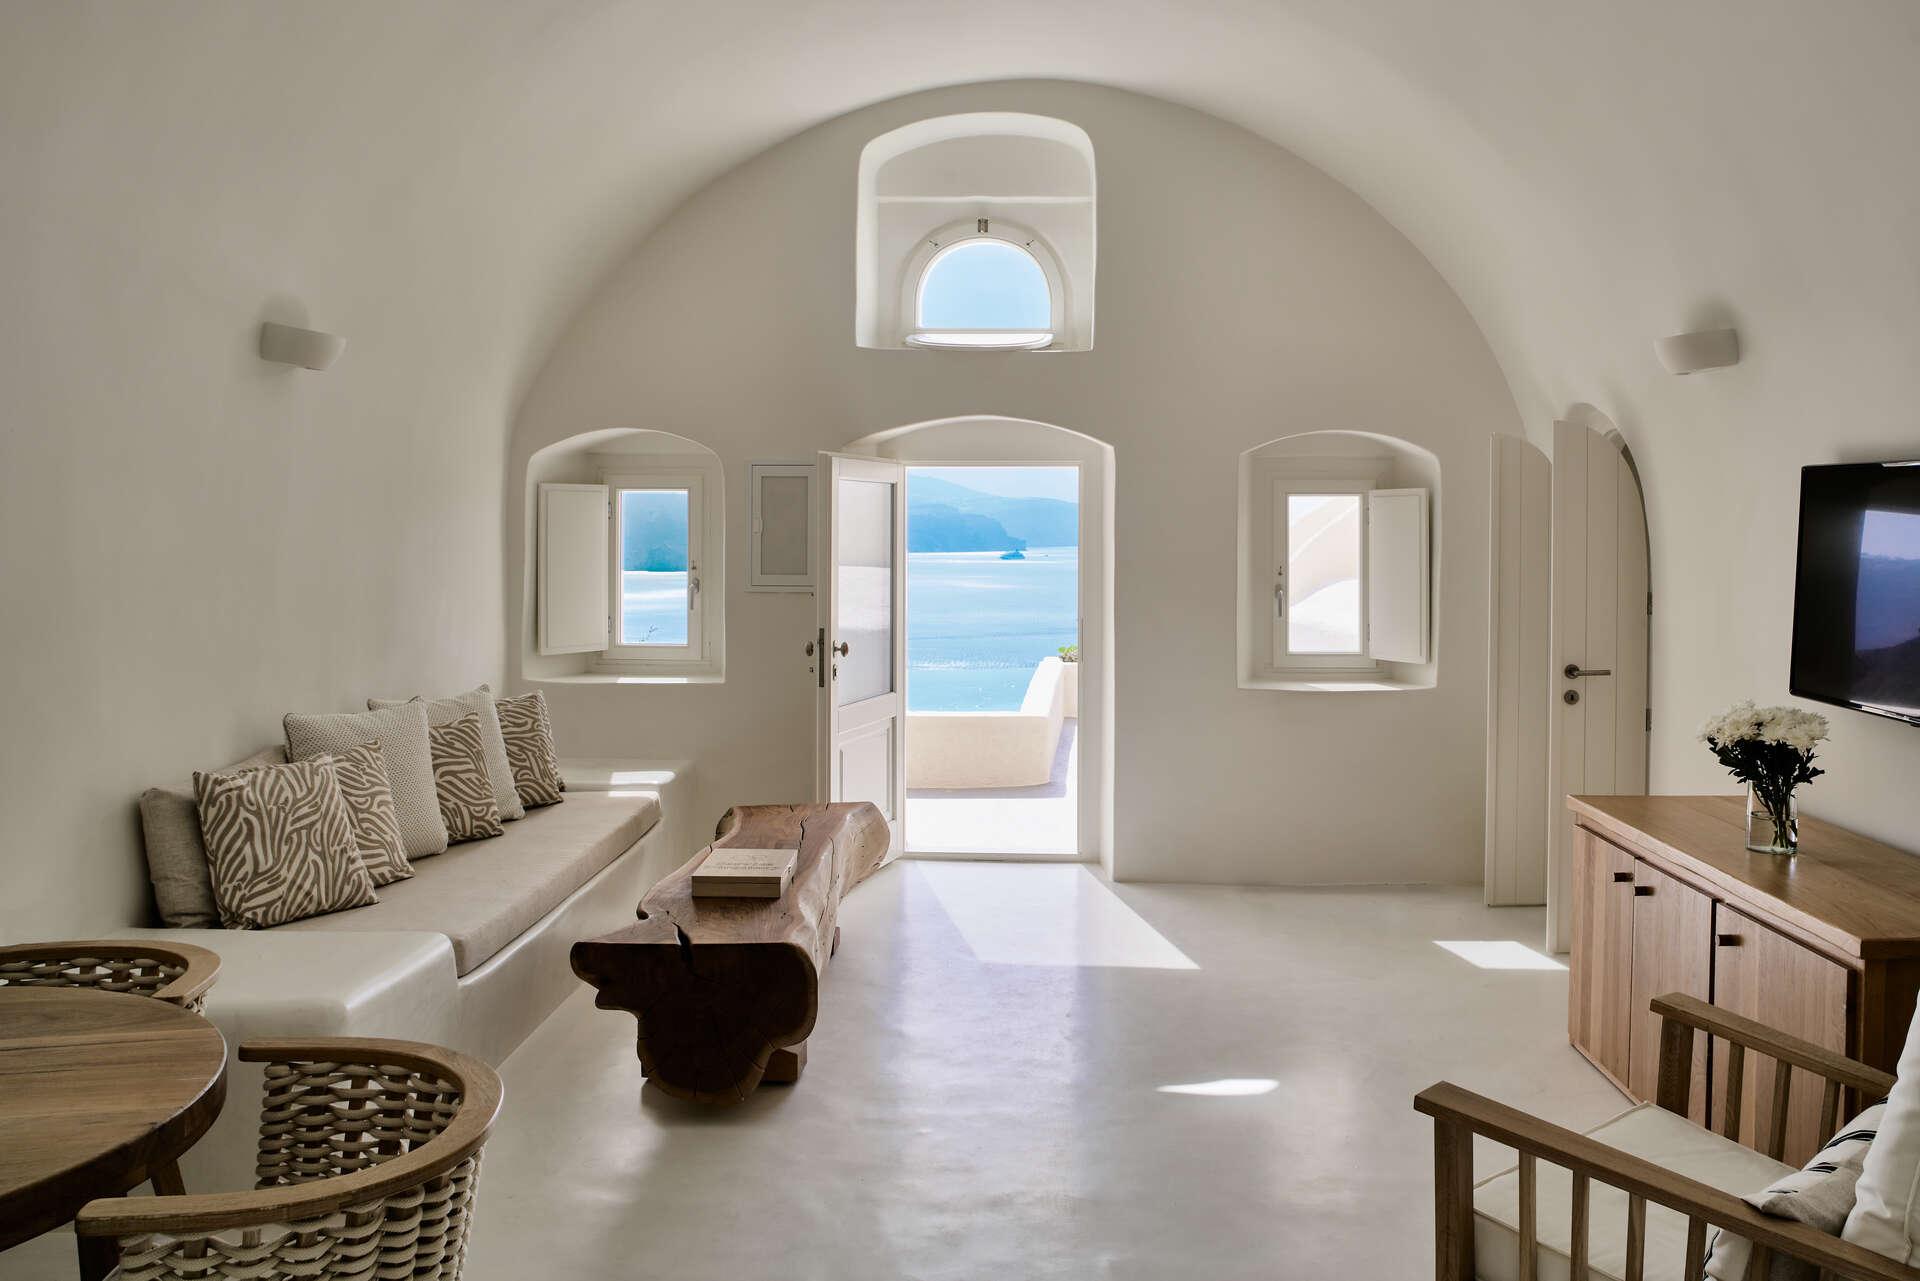 - Holistic Villa - Image 1/13